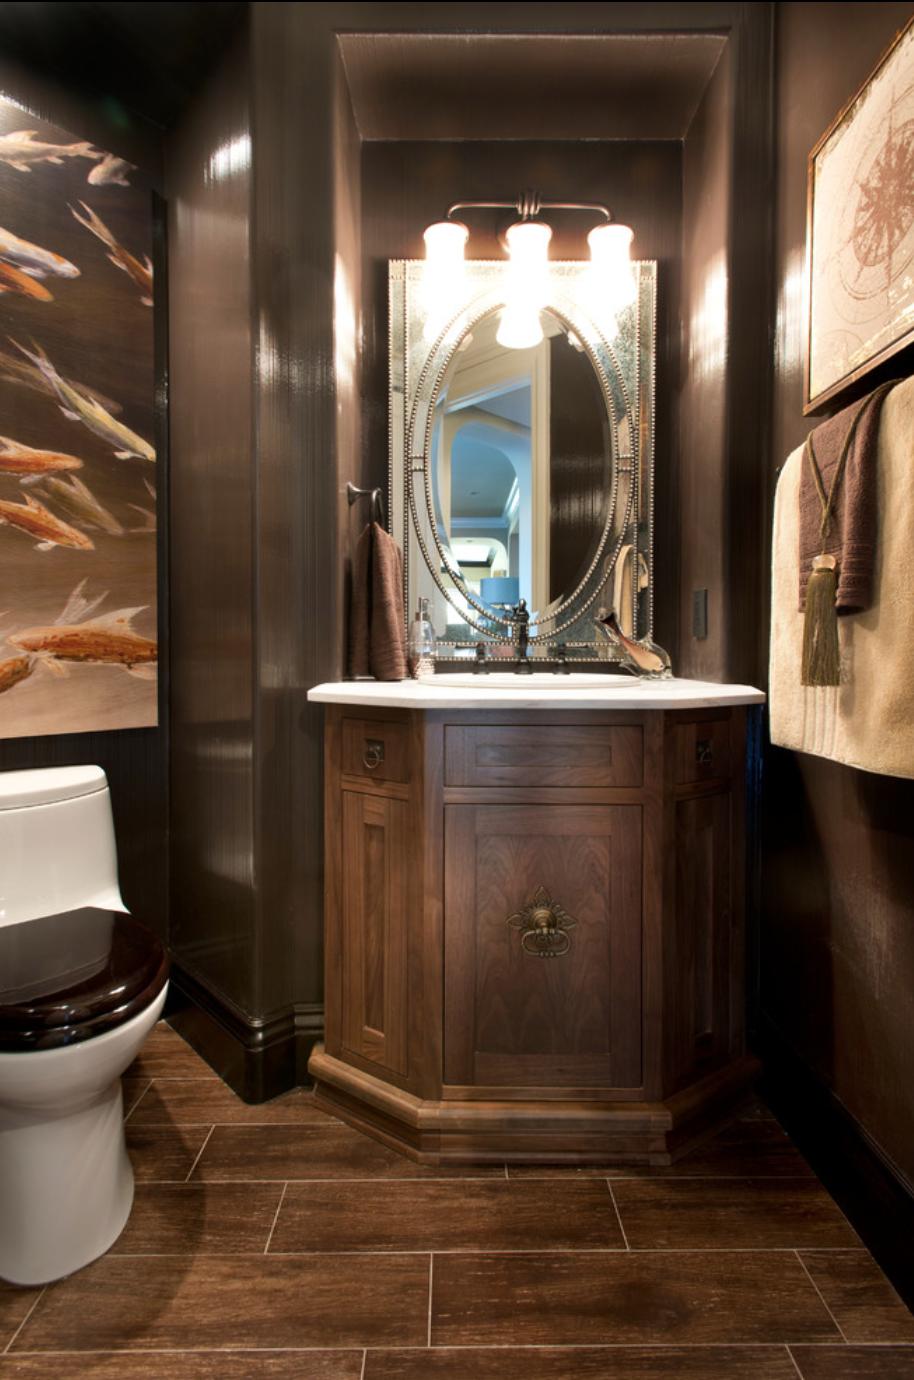 San Diego Ca Interior Designers Top Designer Robeson Design Glamorous Bathroom Decor Small Bathroom Remodel Designs Robeson Design #robeson #design #living #room